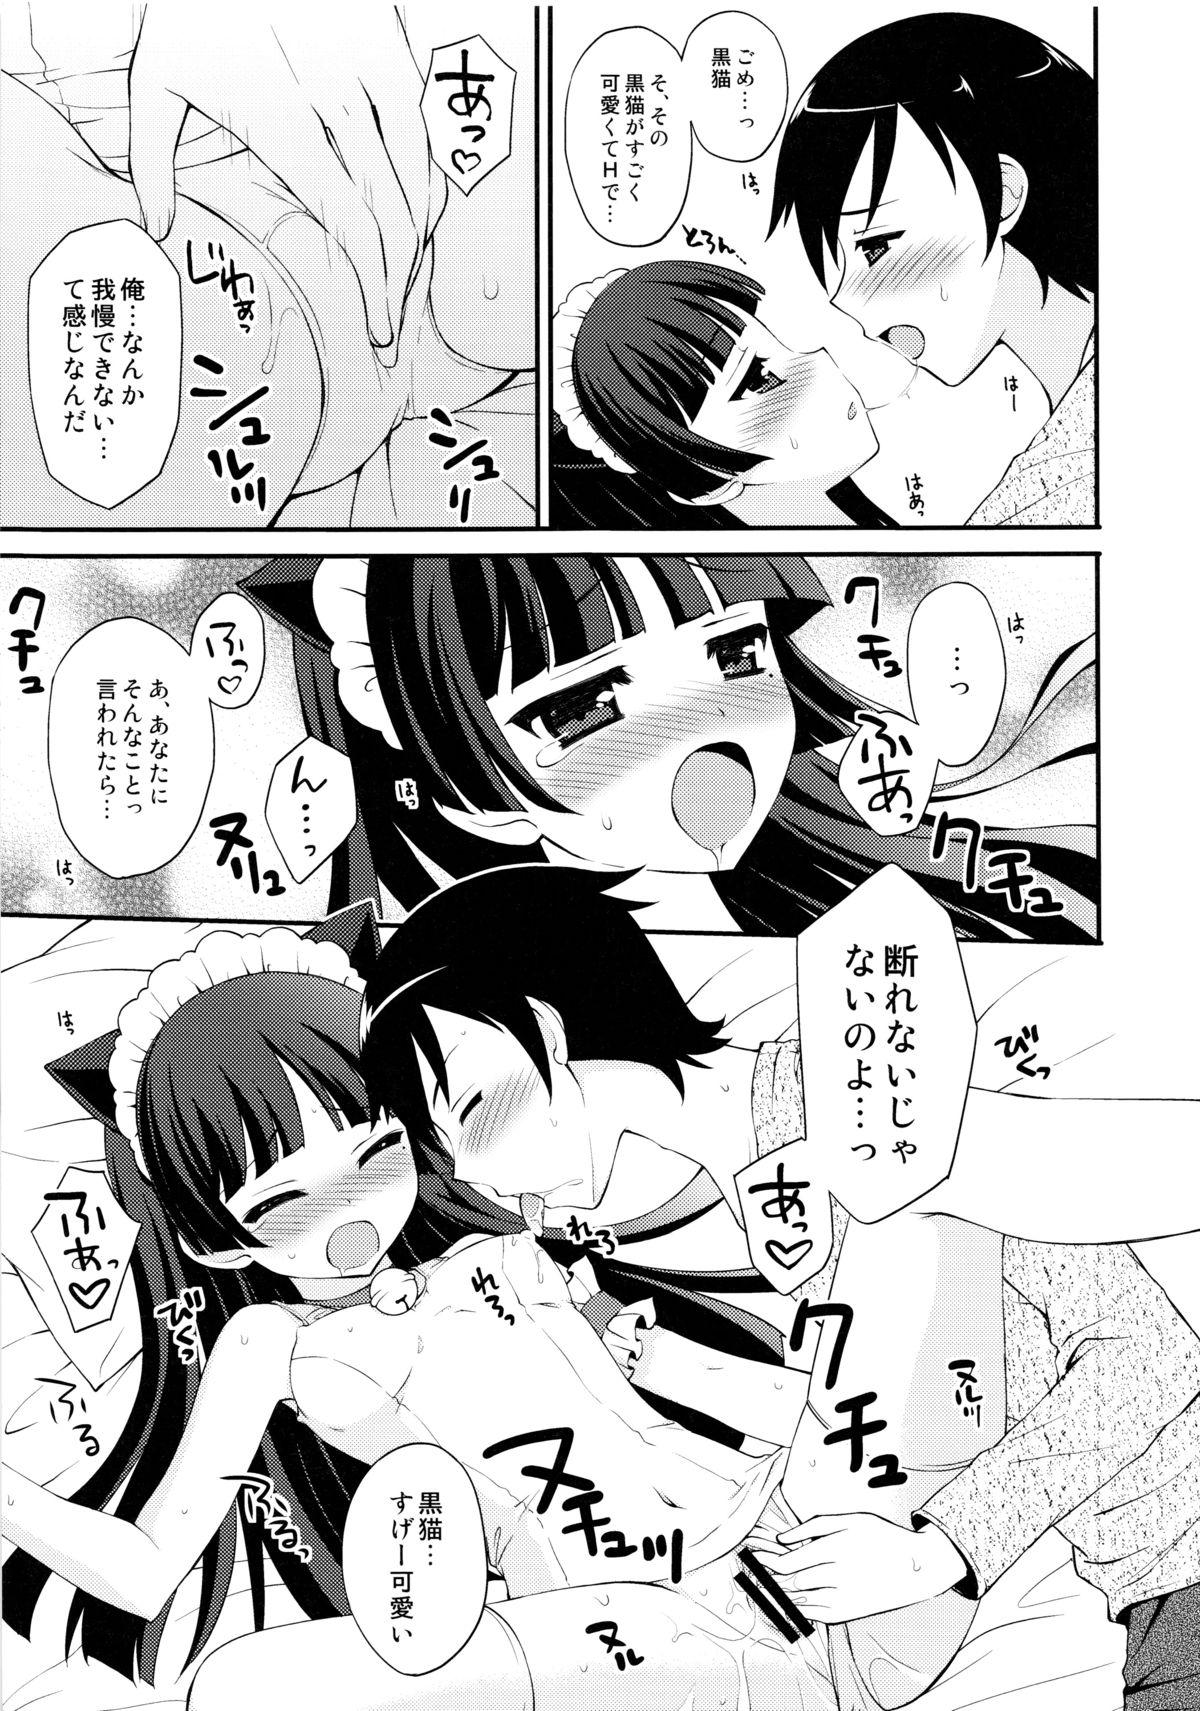 School-mer! School Mizugi Bloomer Joshi Anthology 85